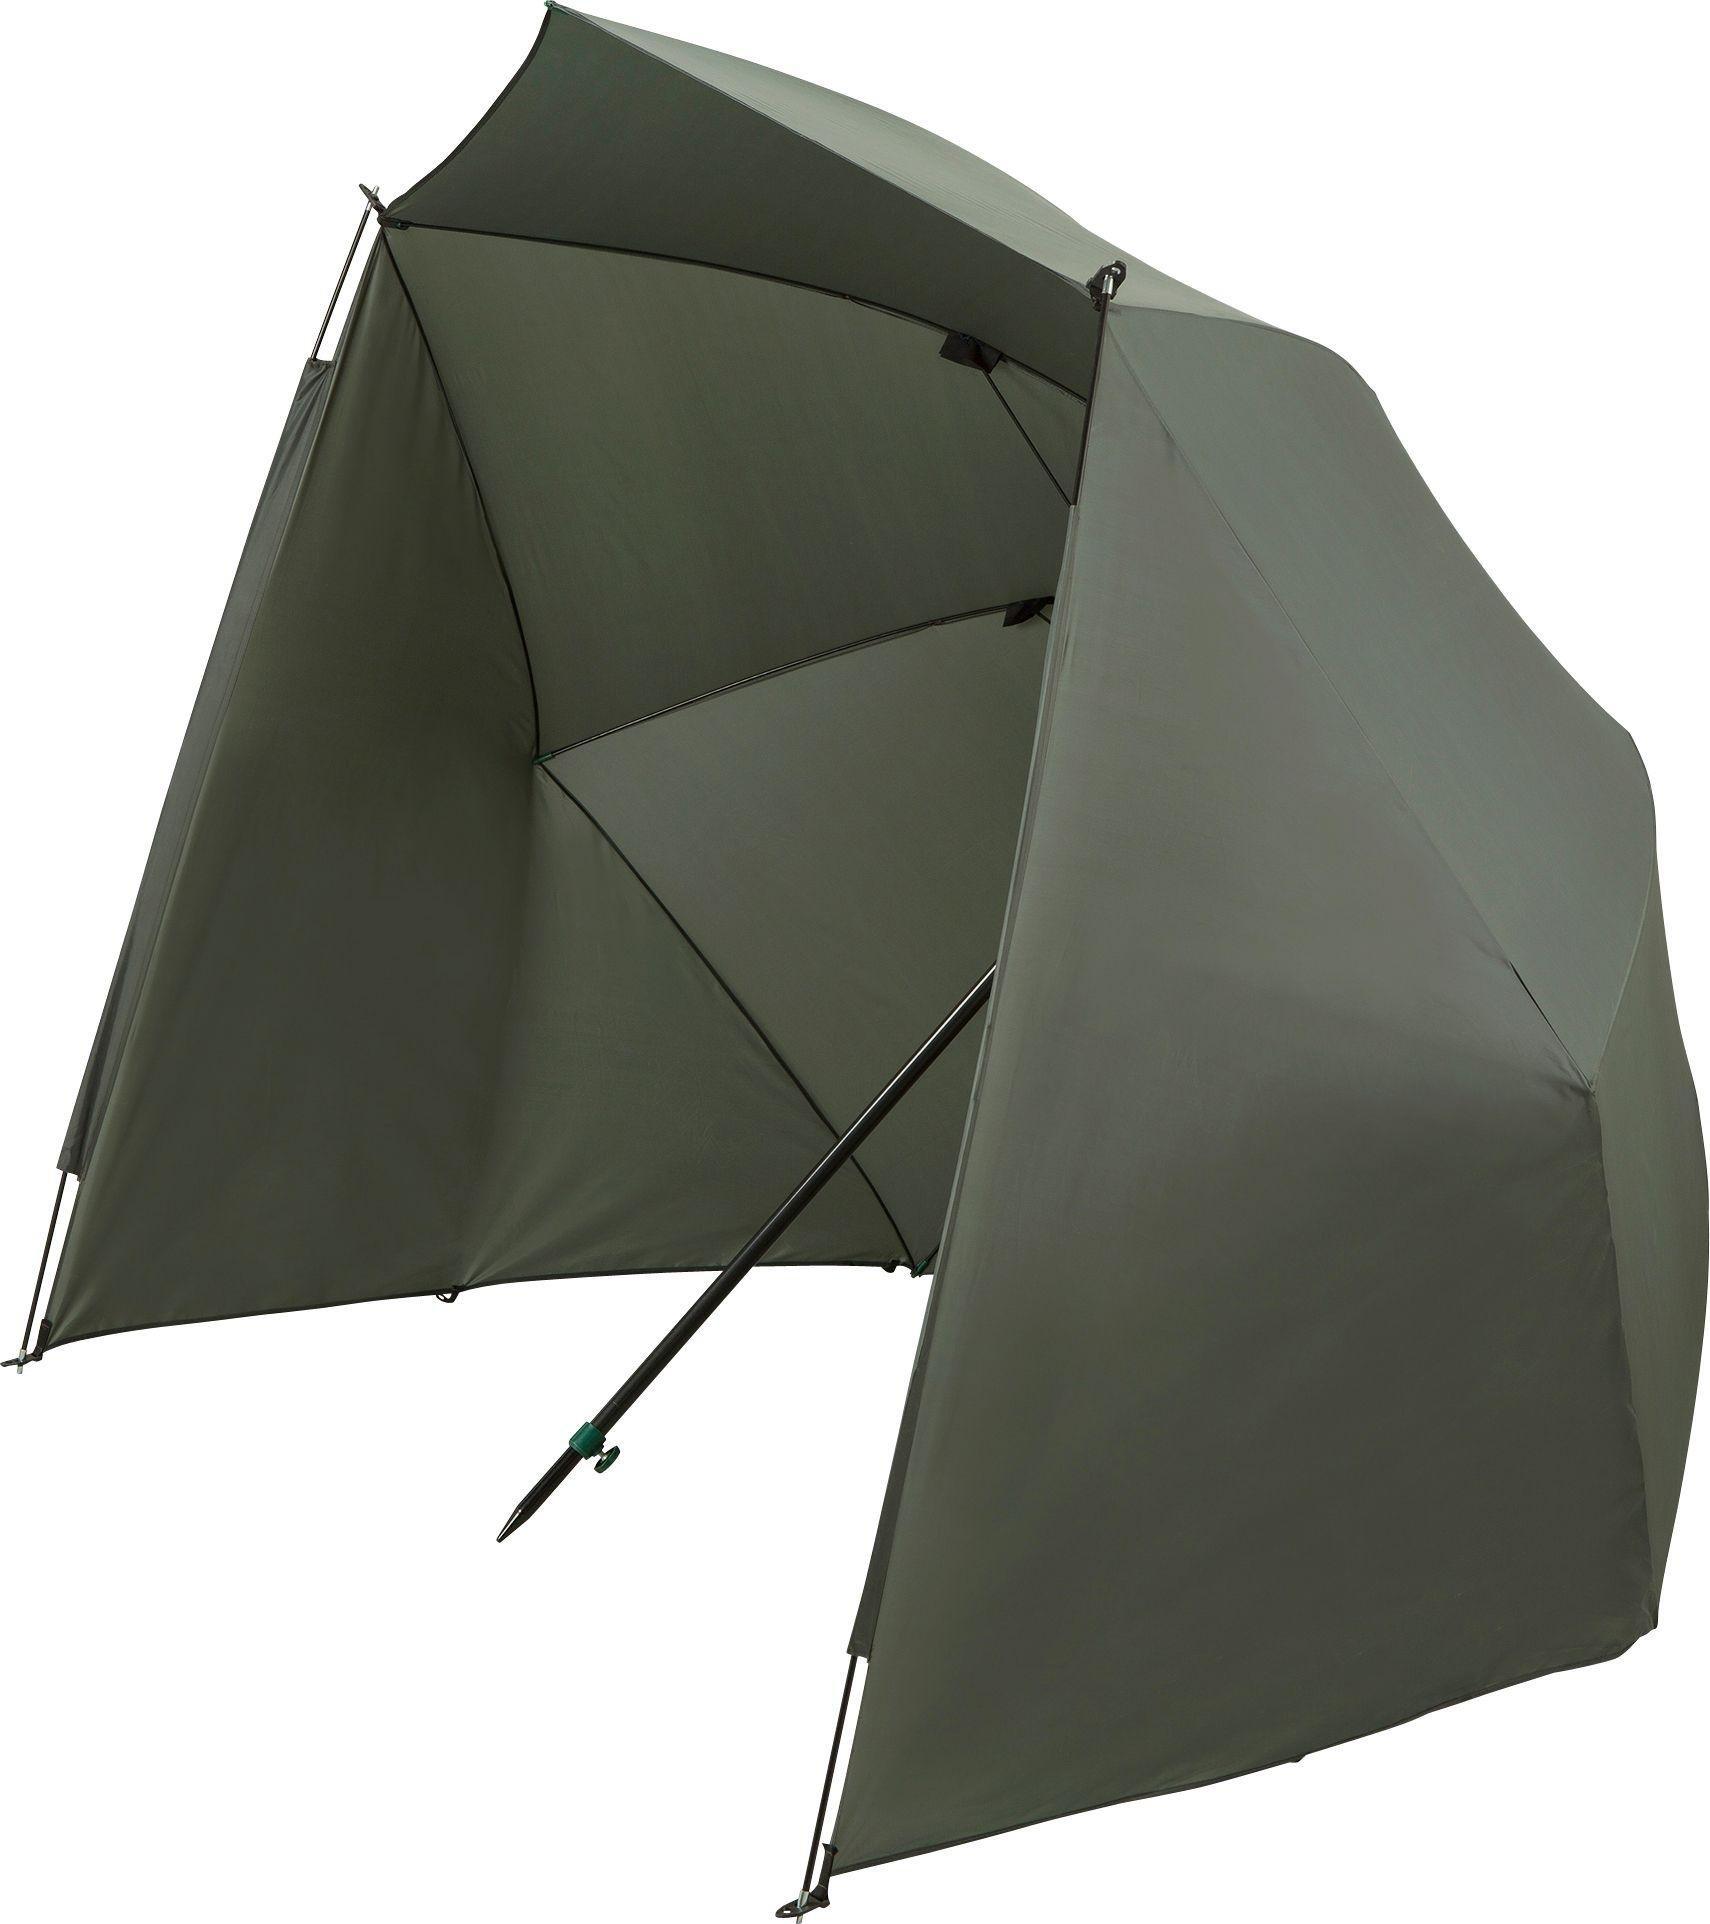 Keenets - Bivvy Fishing Shelter Umbrella lowest price